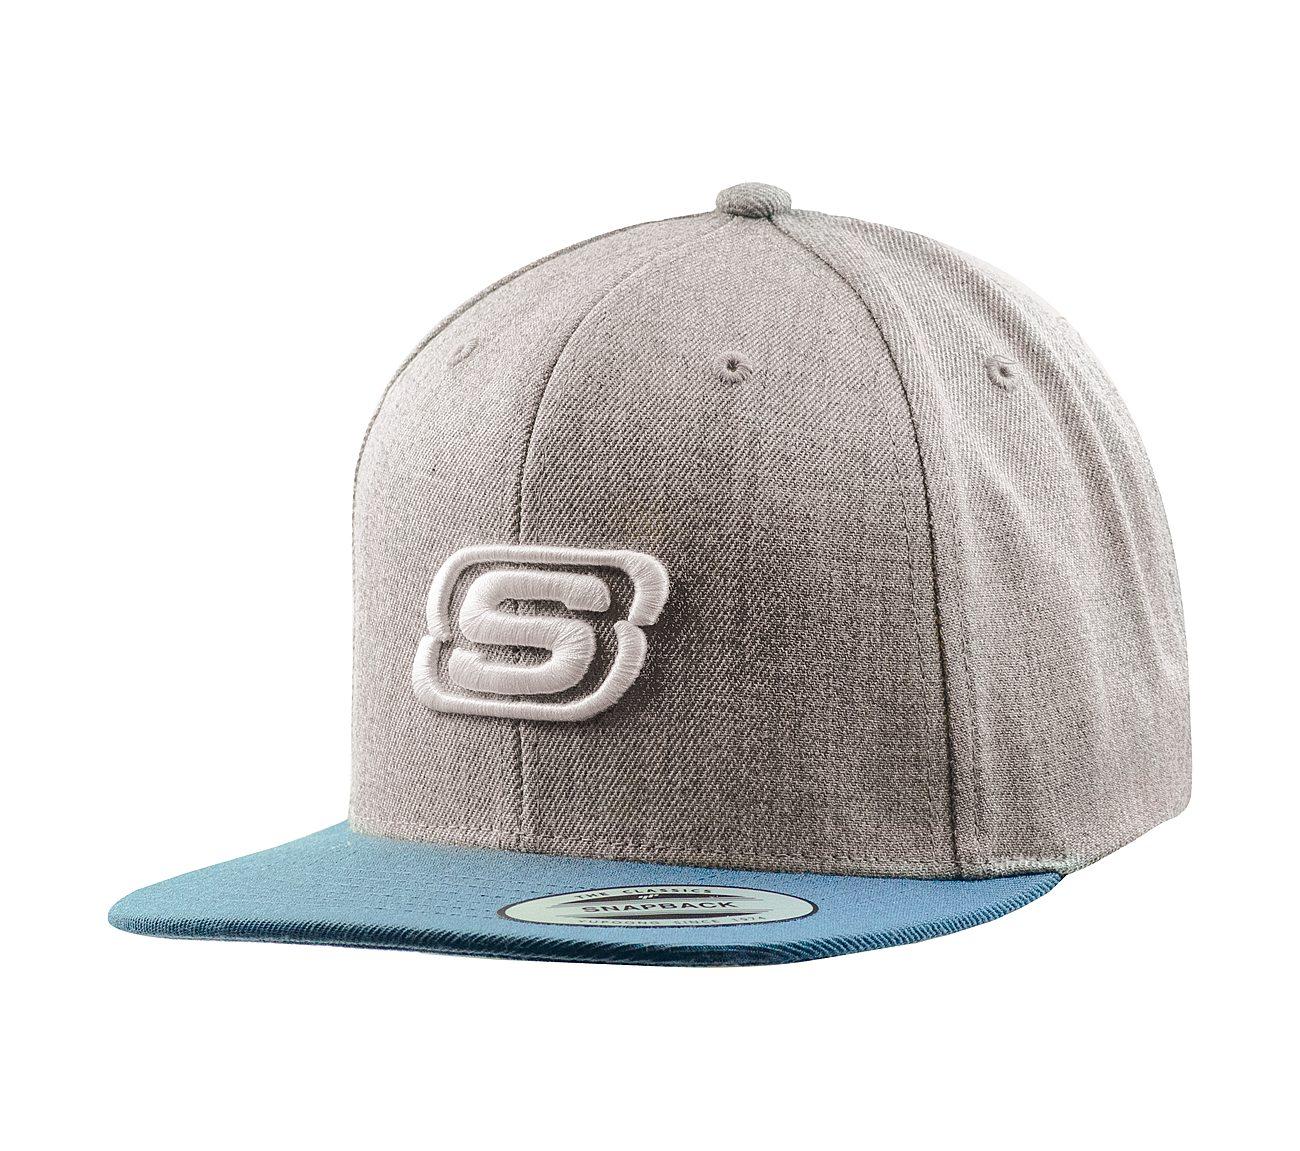 Flatbill Contrast Hat